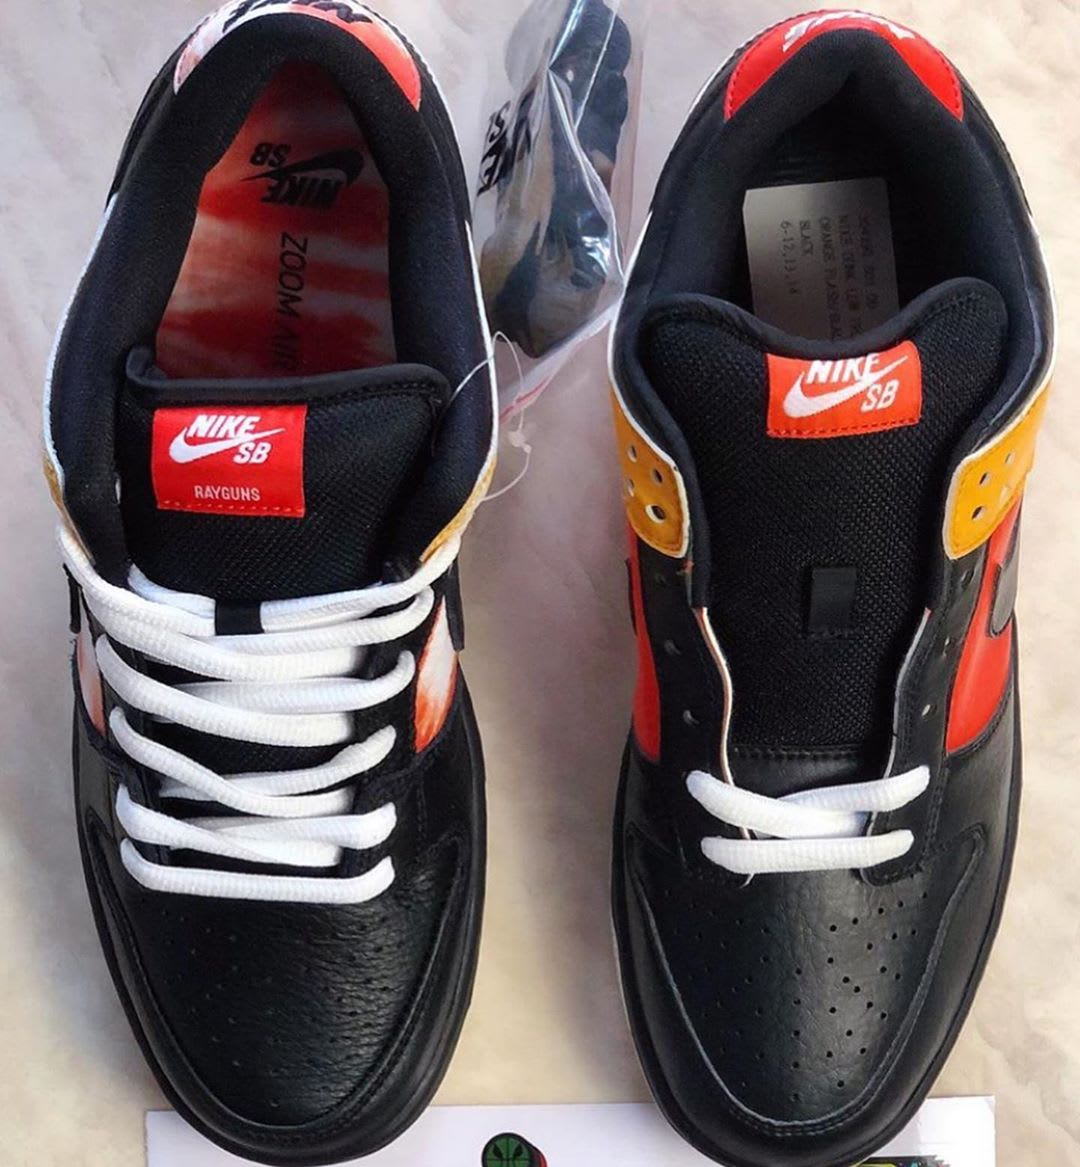 Nike SB Dunk Low 'Raygun Tie Dye' BQ6832-001 (Top)